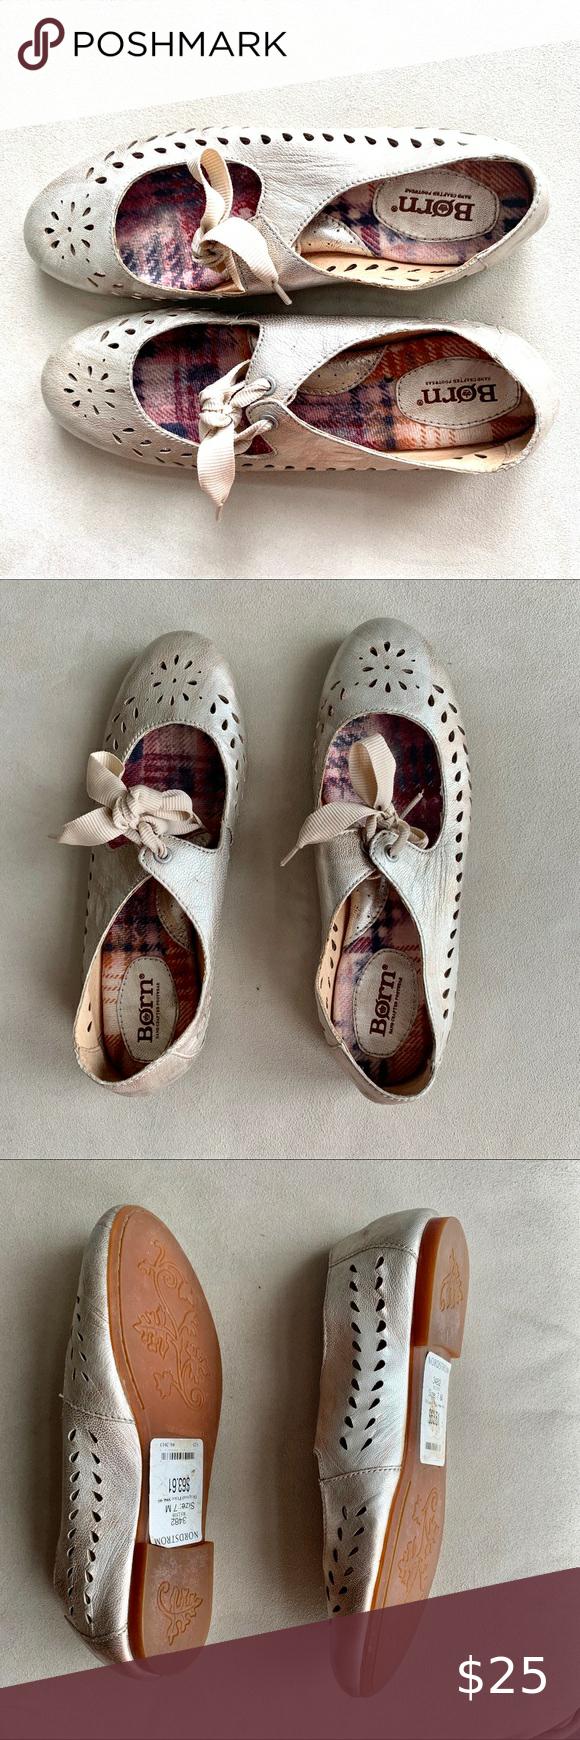 Women Flats Shoes Women Genuine Leather Shoes Woman Cutout Loafers Ballet Flats White 7M US